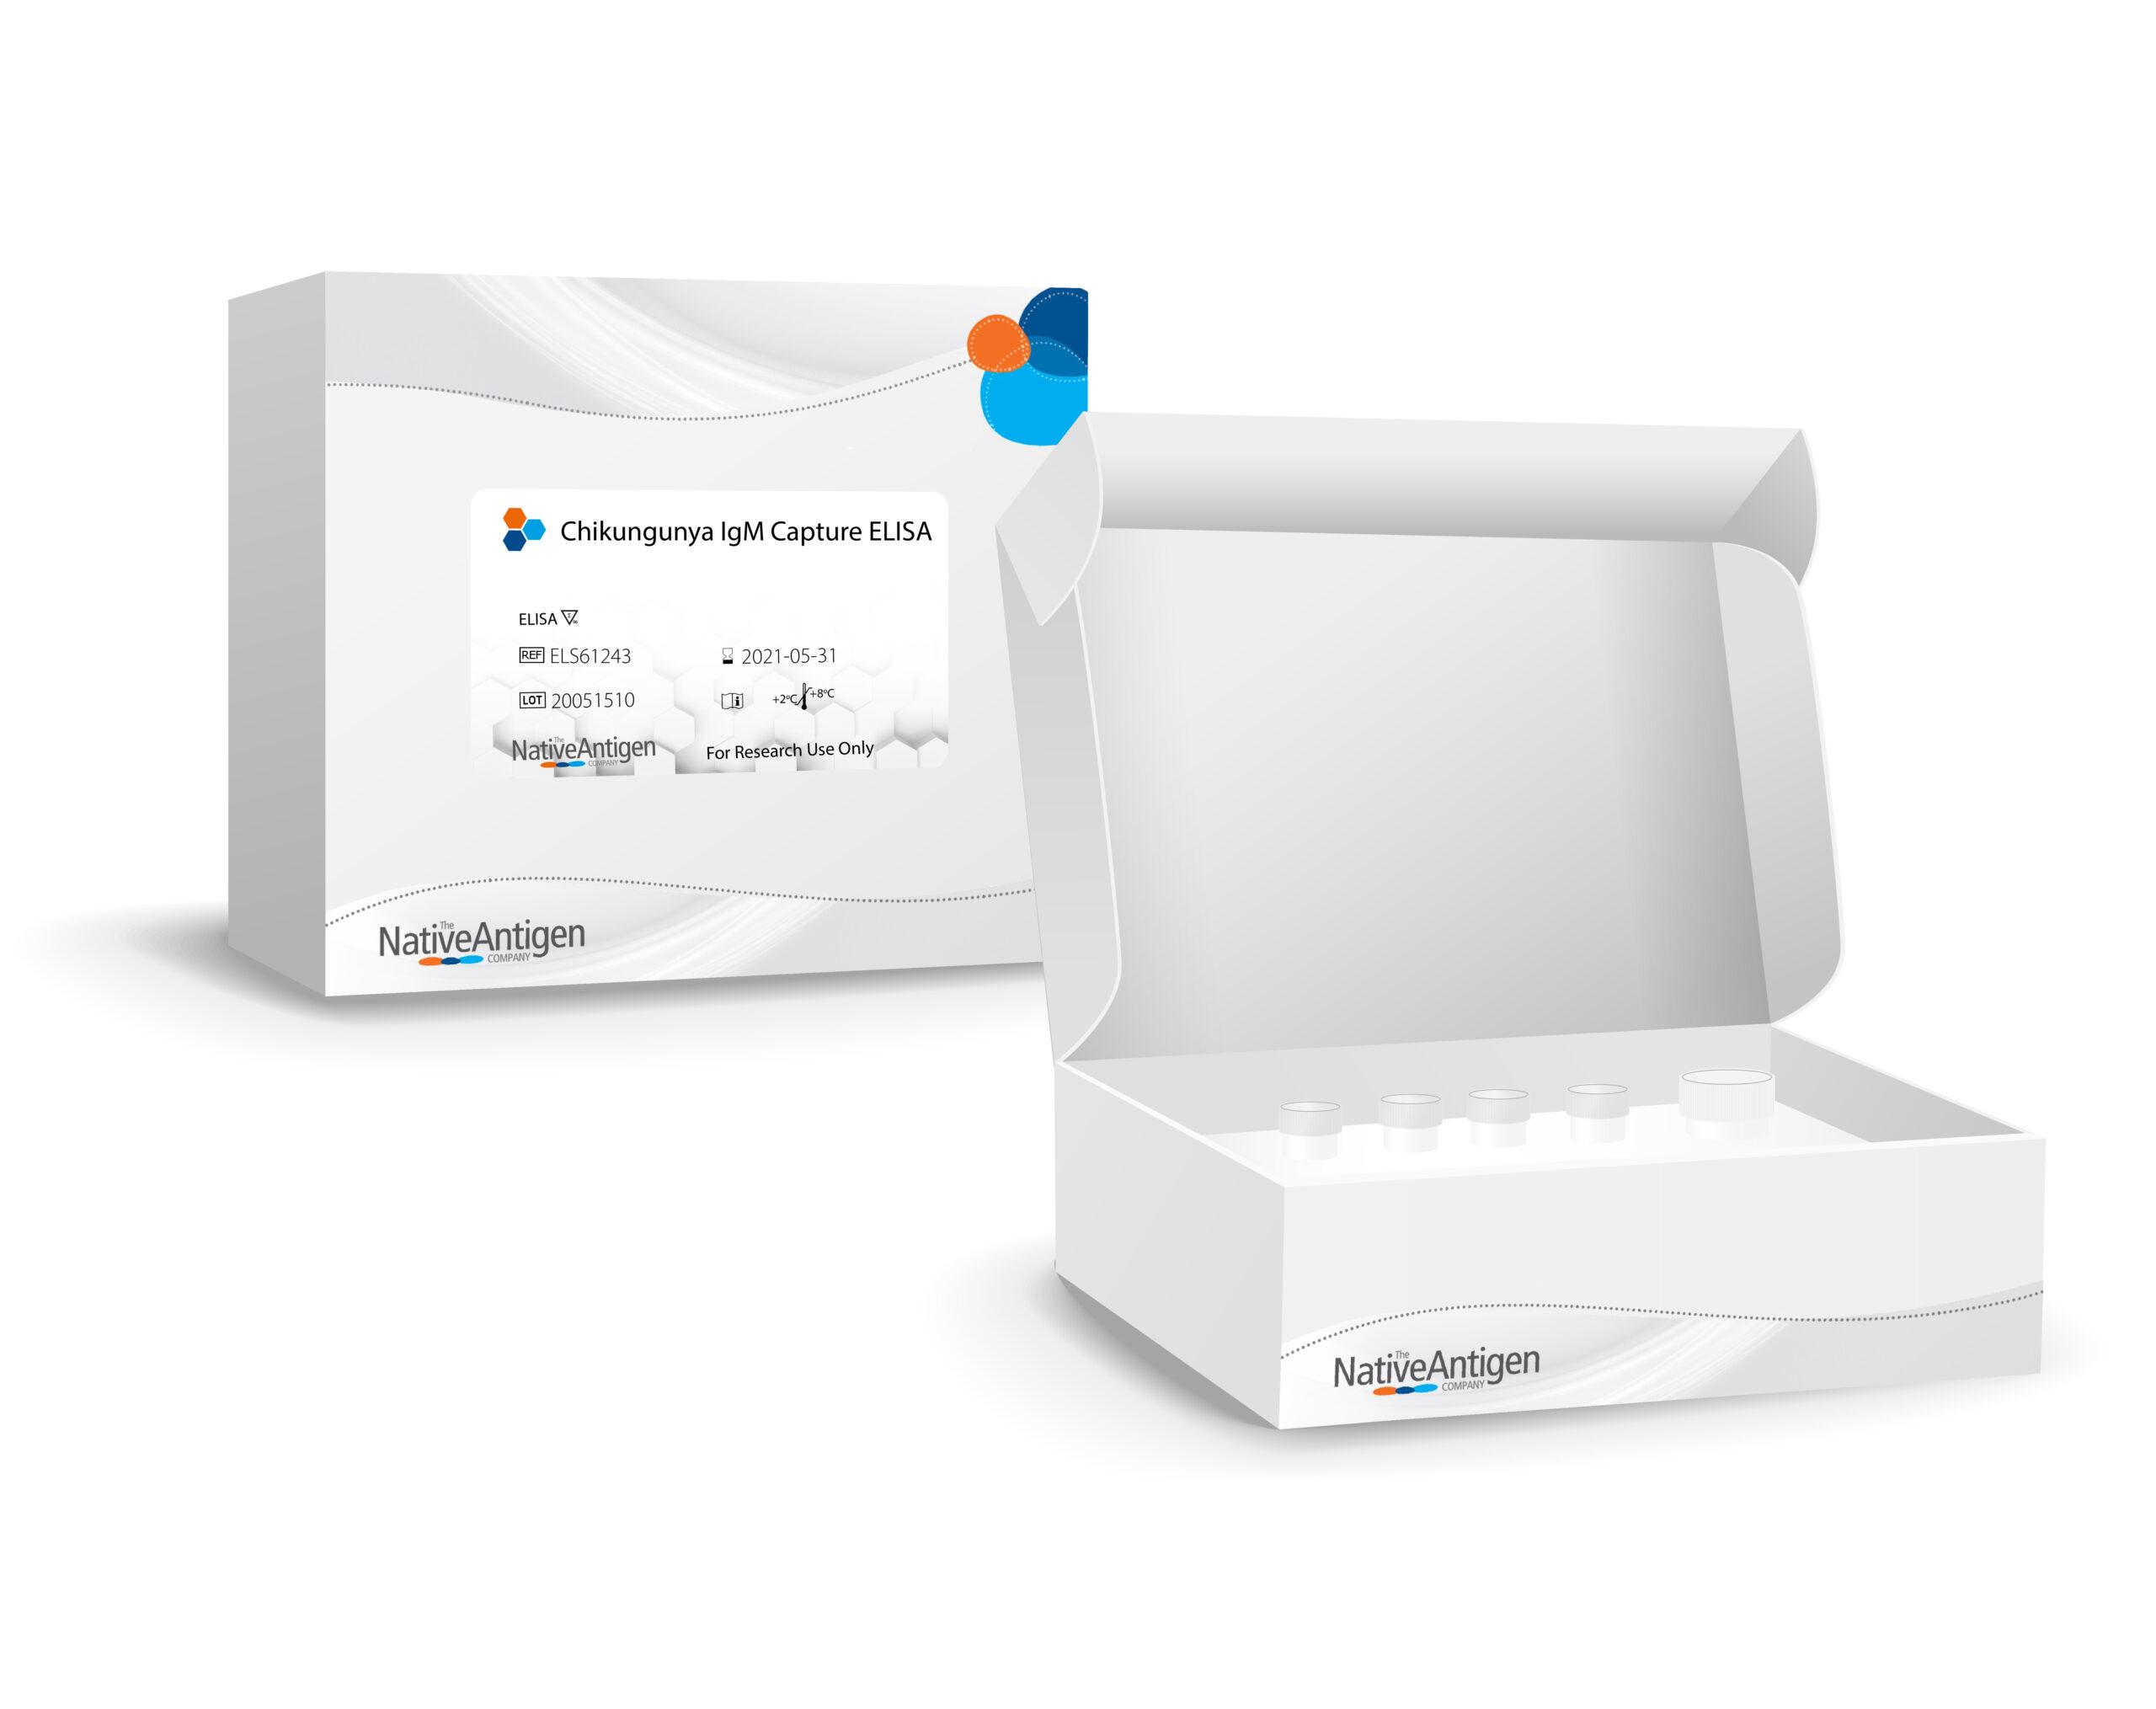 TheNativeAntigenCompany/Chikungunya Virus IgM capture ELISA/ELS61243